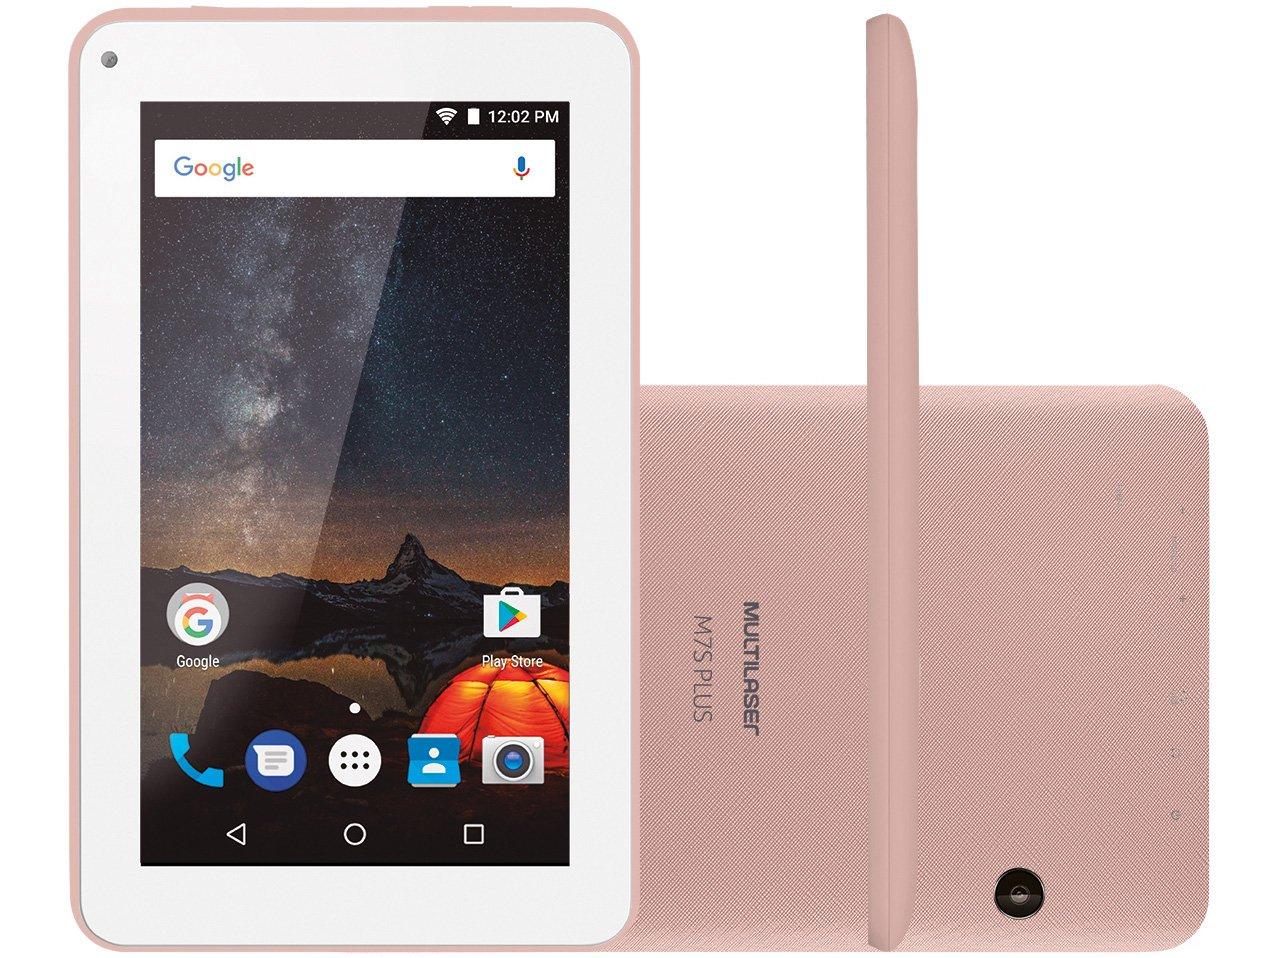 Foto 5 - Tablet Multilaser M7S Plus 8GB 7 Wi-Fi - Android 7.0 Proc. Quad Core Câmera Integrada